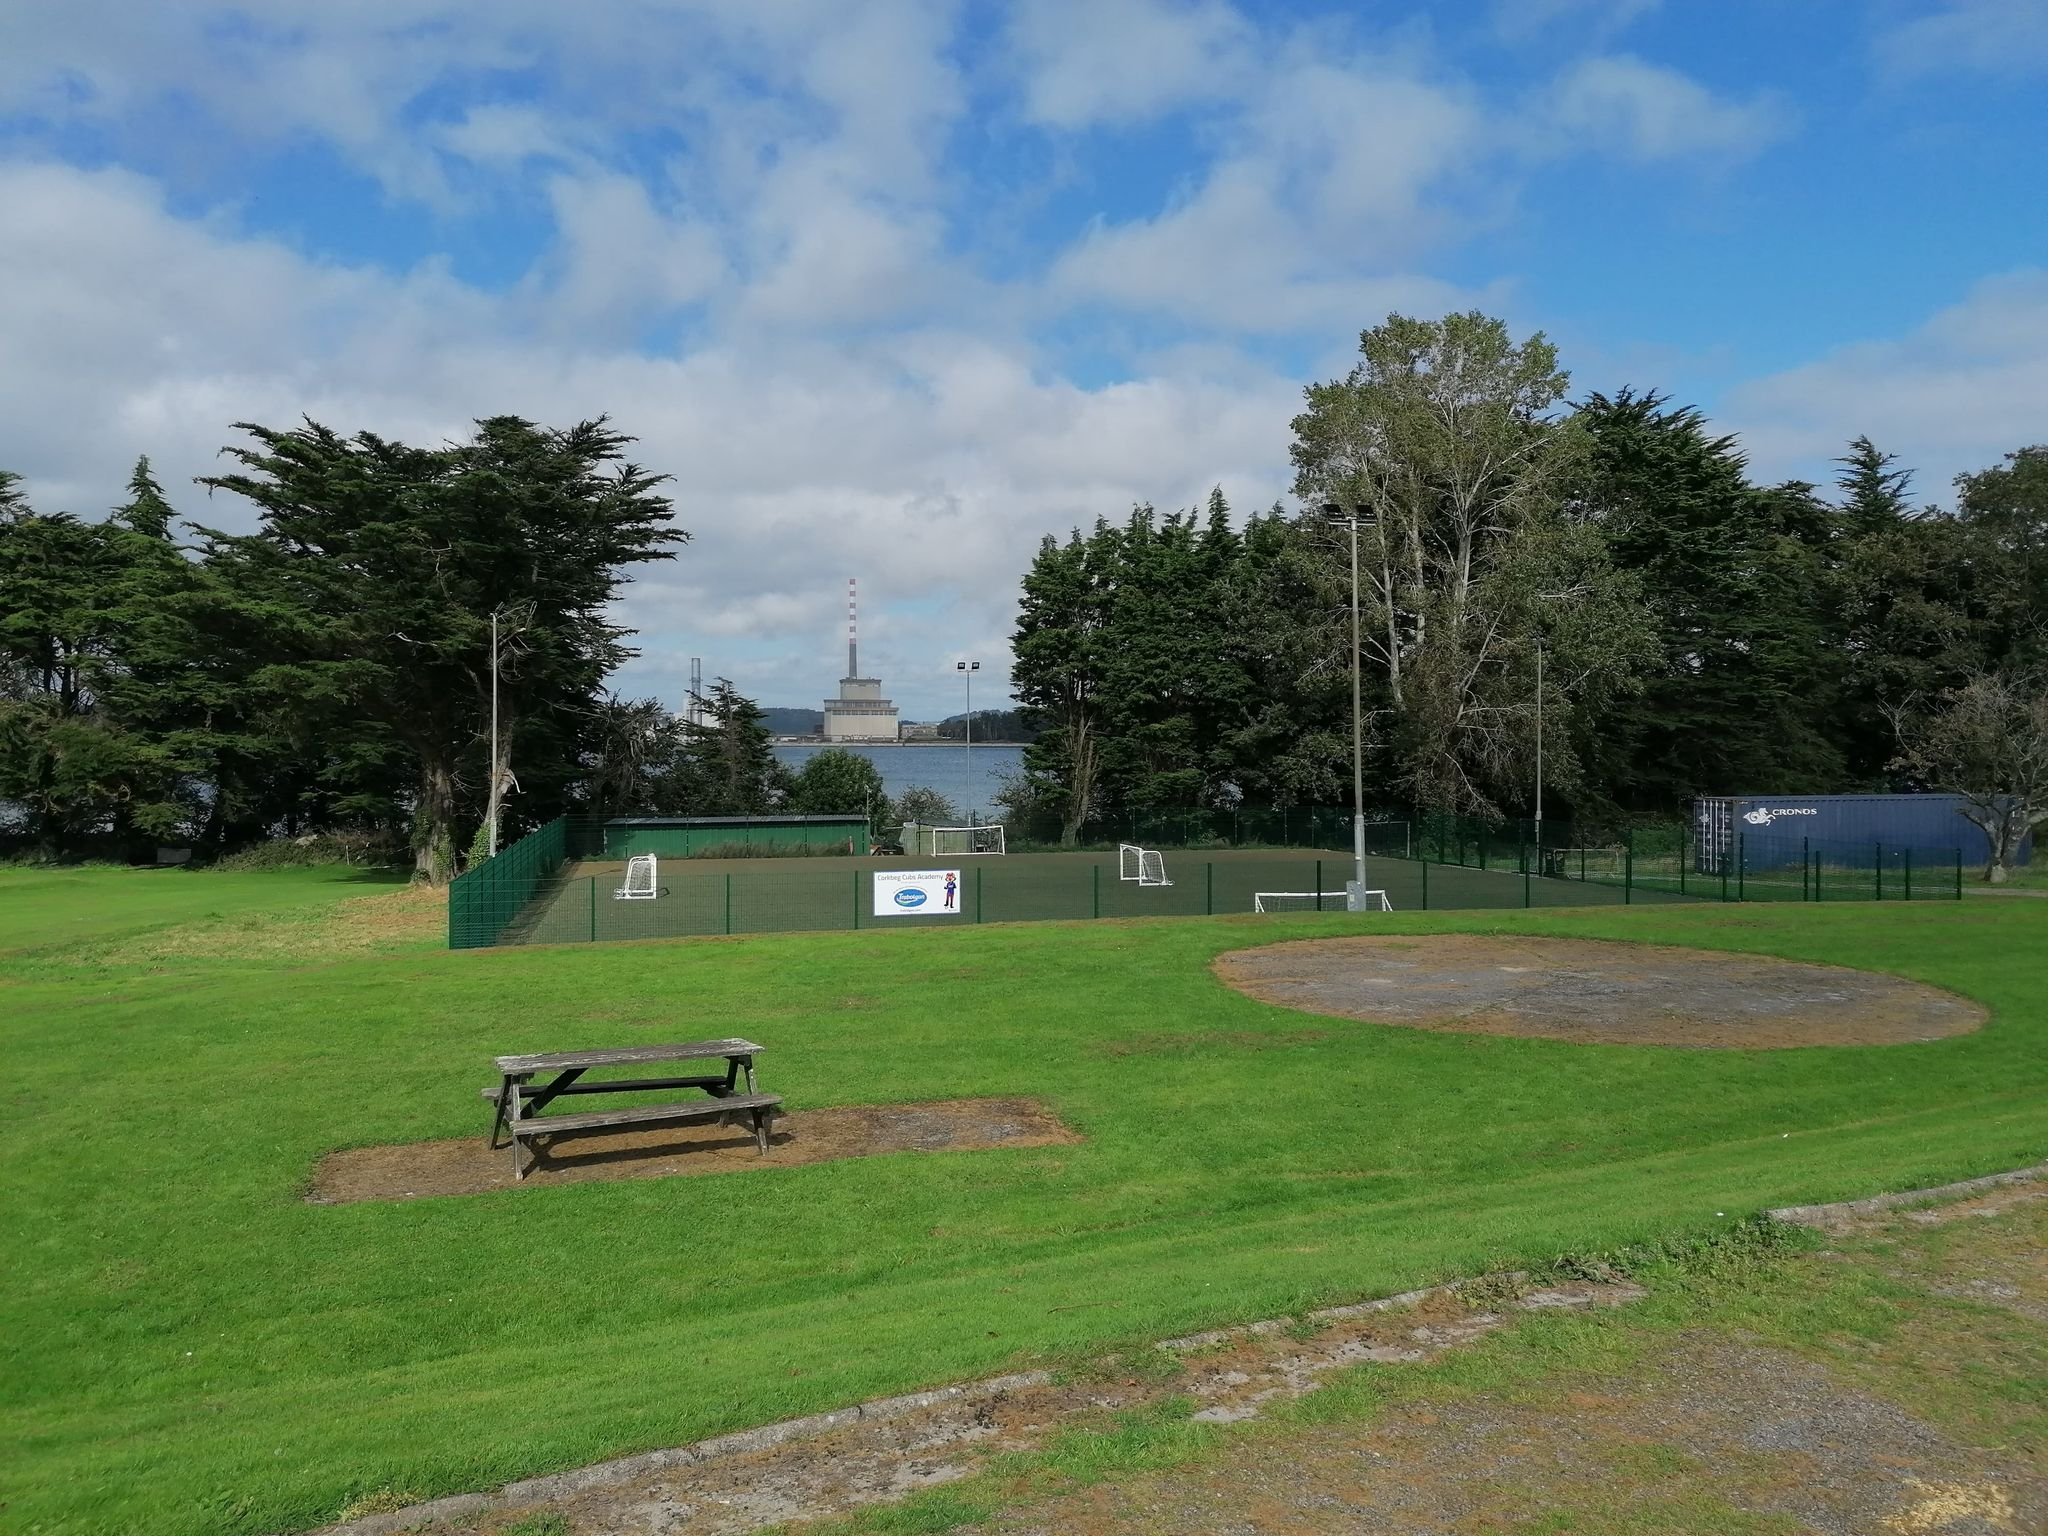 Corkbeg Grounds Notice